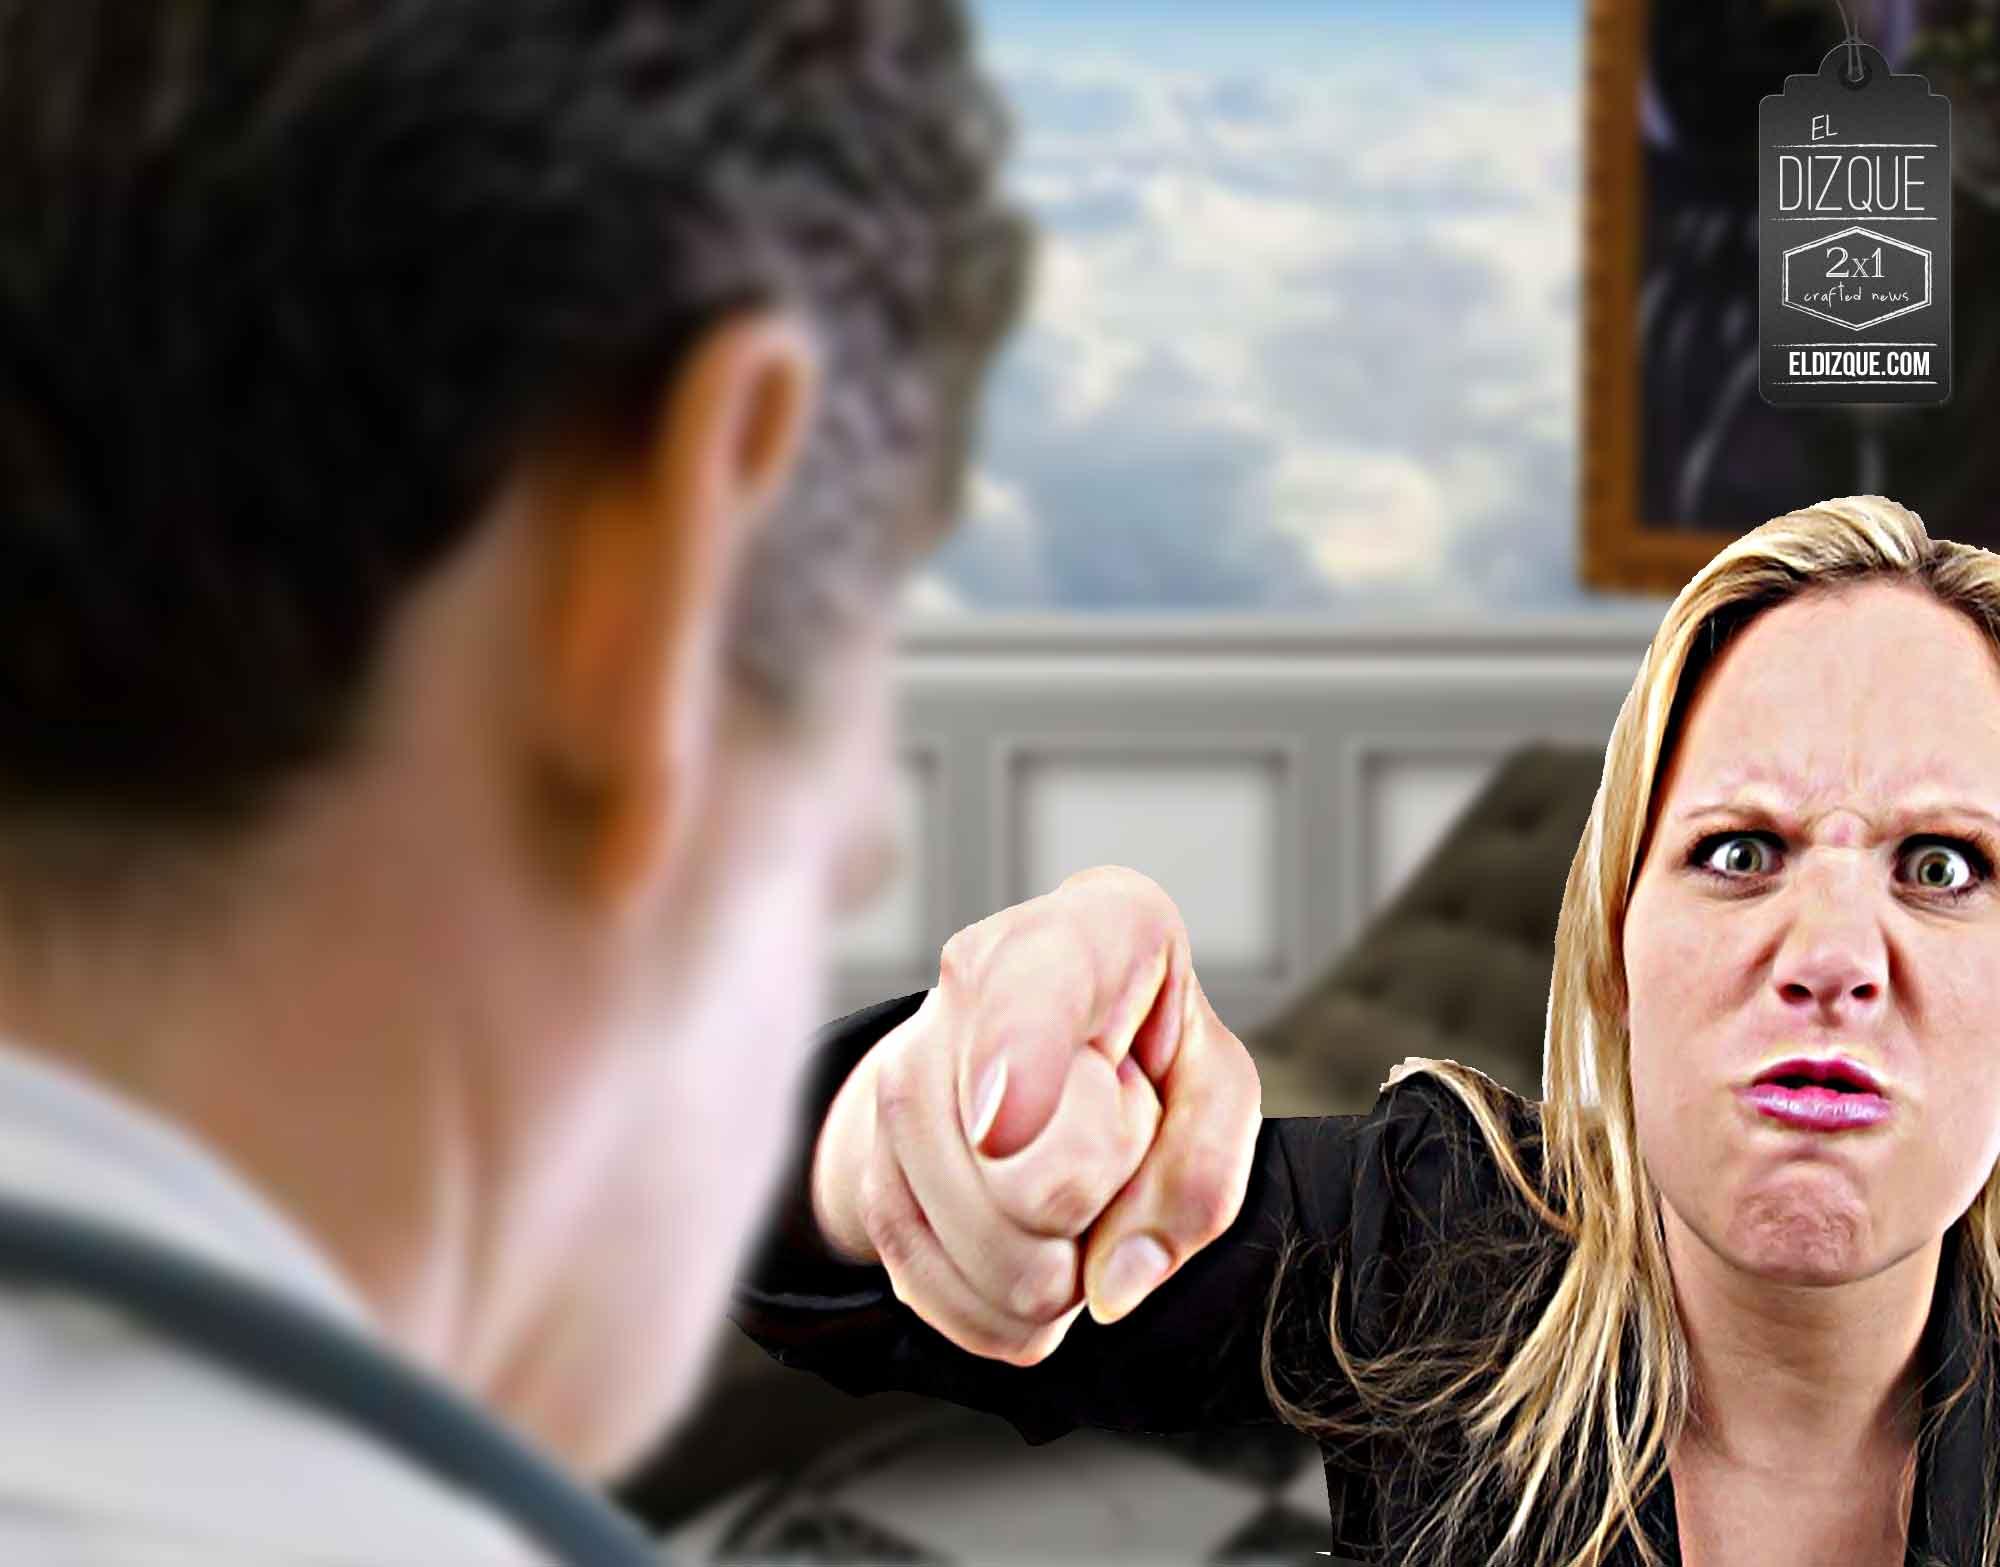 Mujer acusa a su psiquiatra de gaslightning